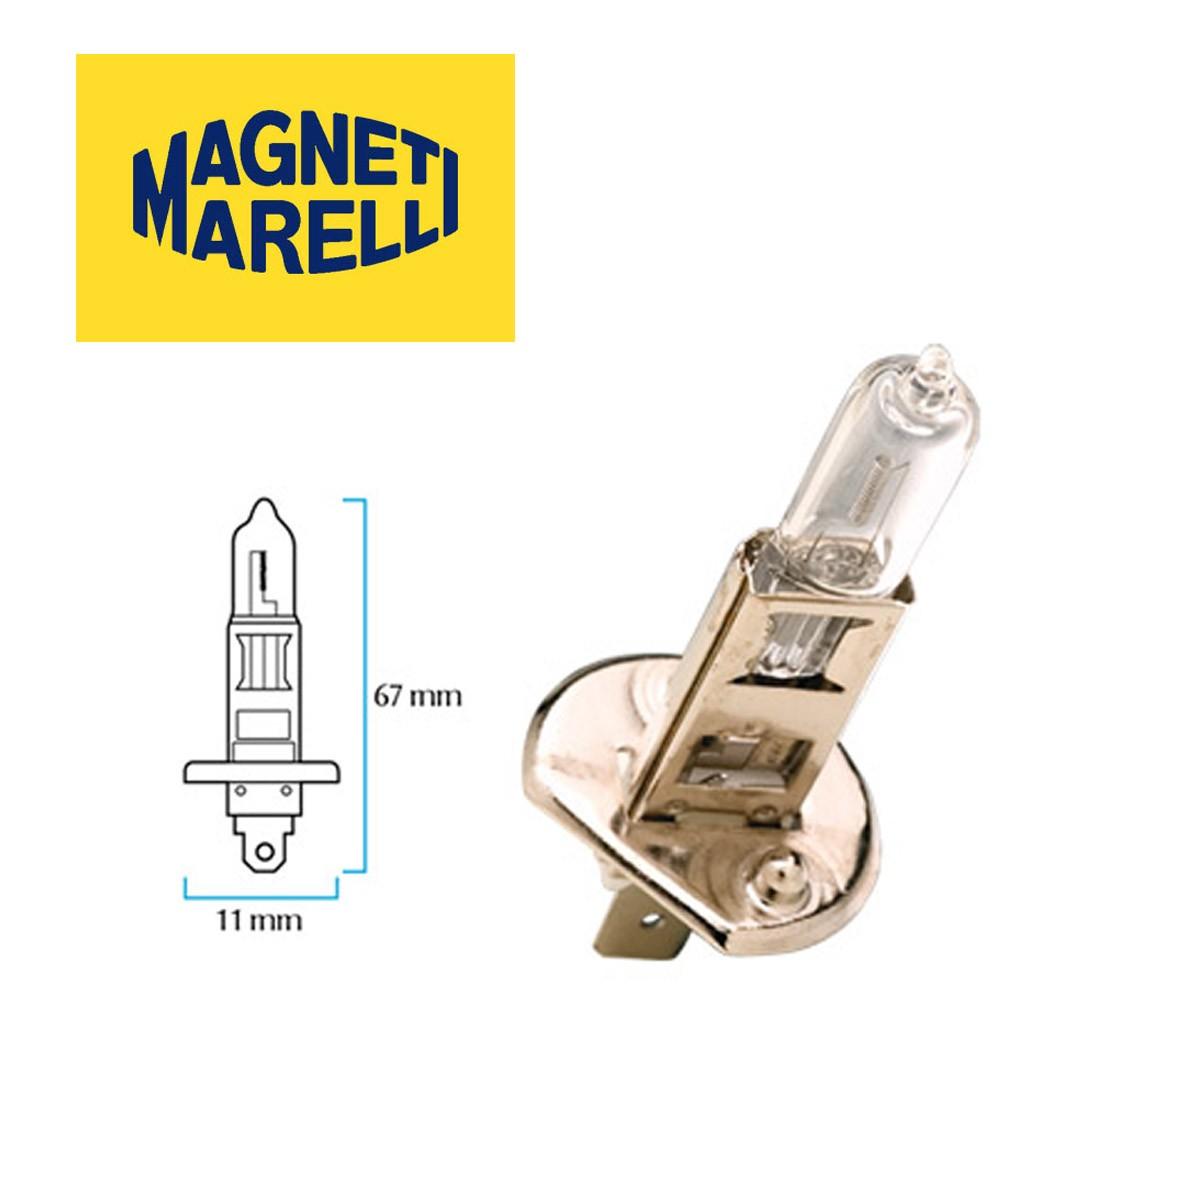 Lampara MAGNETI MARELLI H1 12V 55w UNIVERSAL